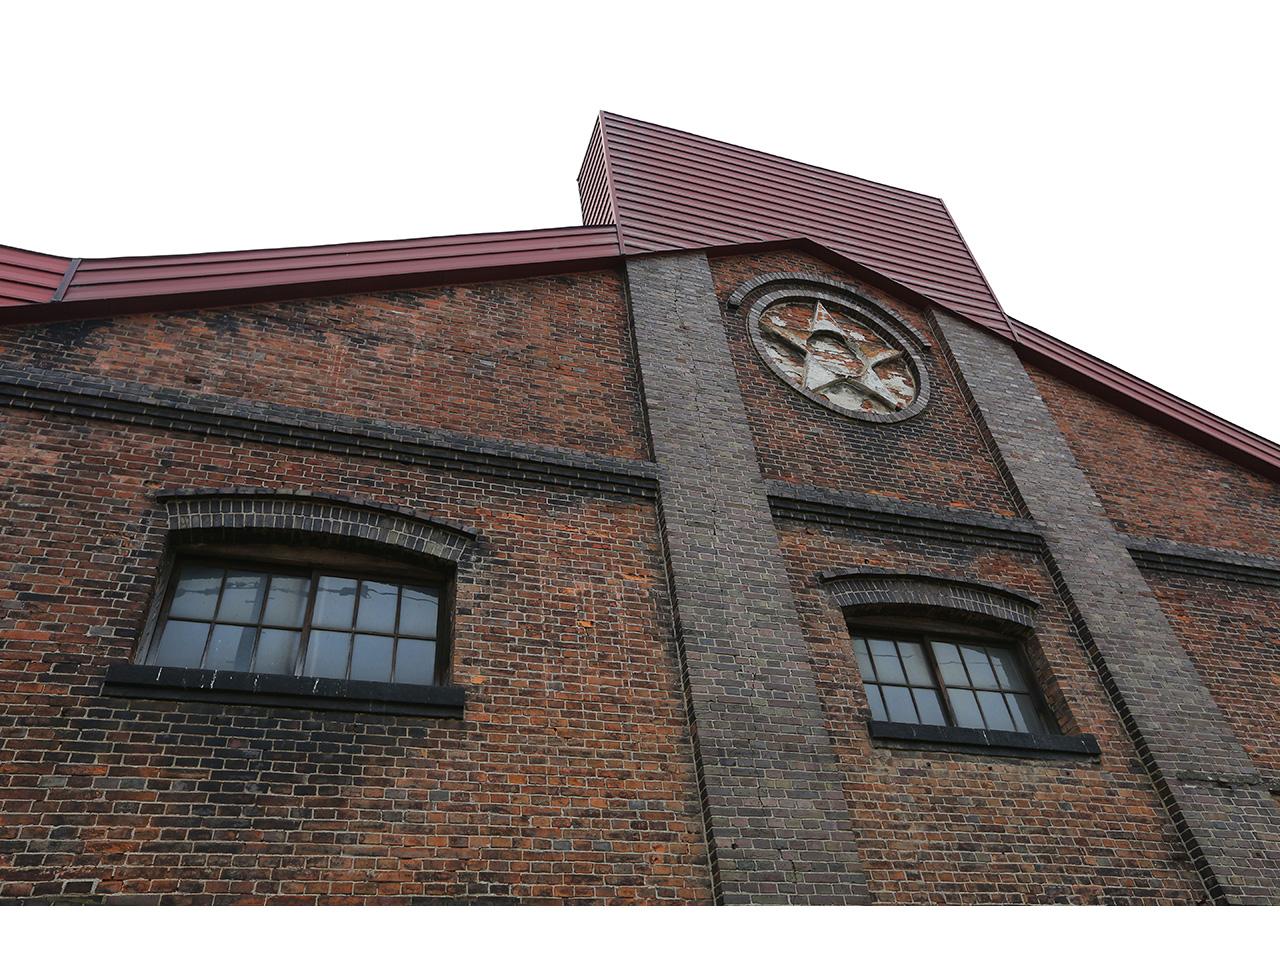 画像:旧北海道炭礦鉄道岩見沢工場(岩見沢レールセンター)(2)